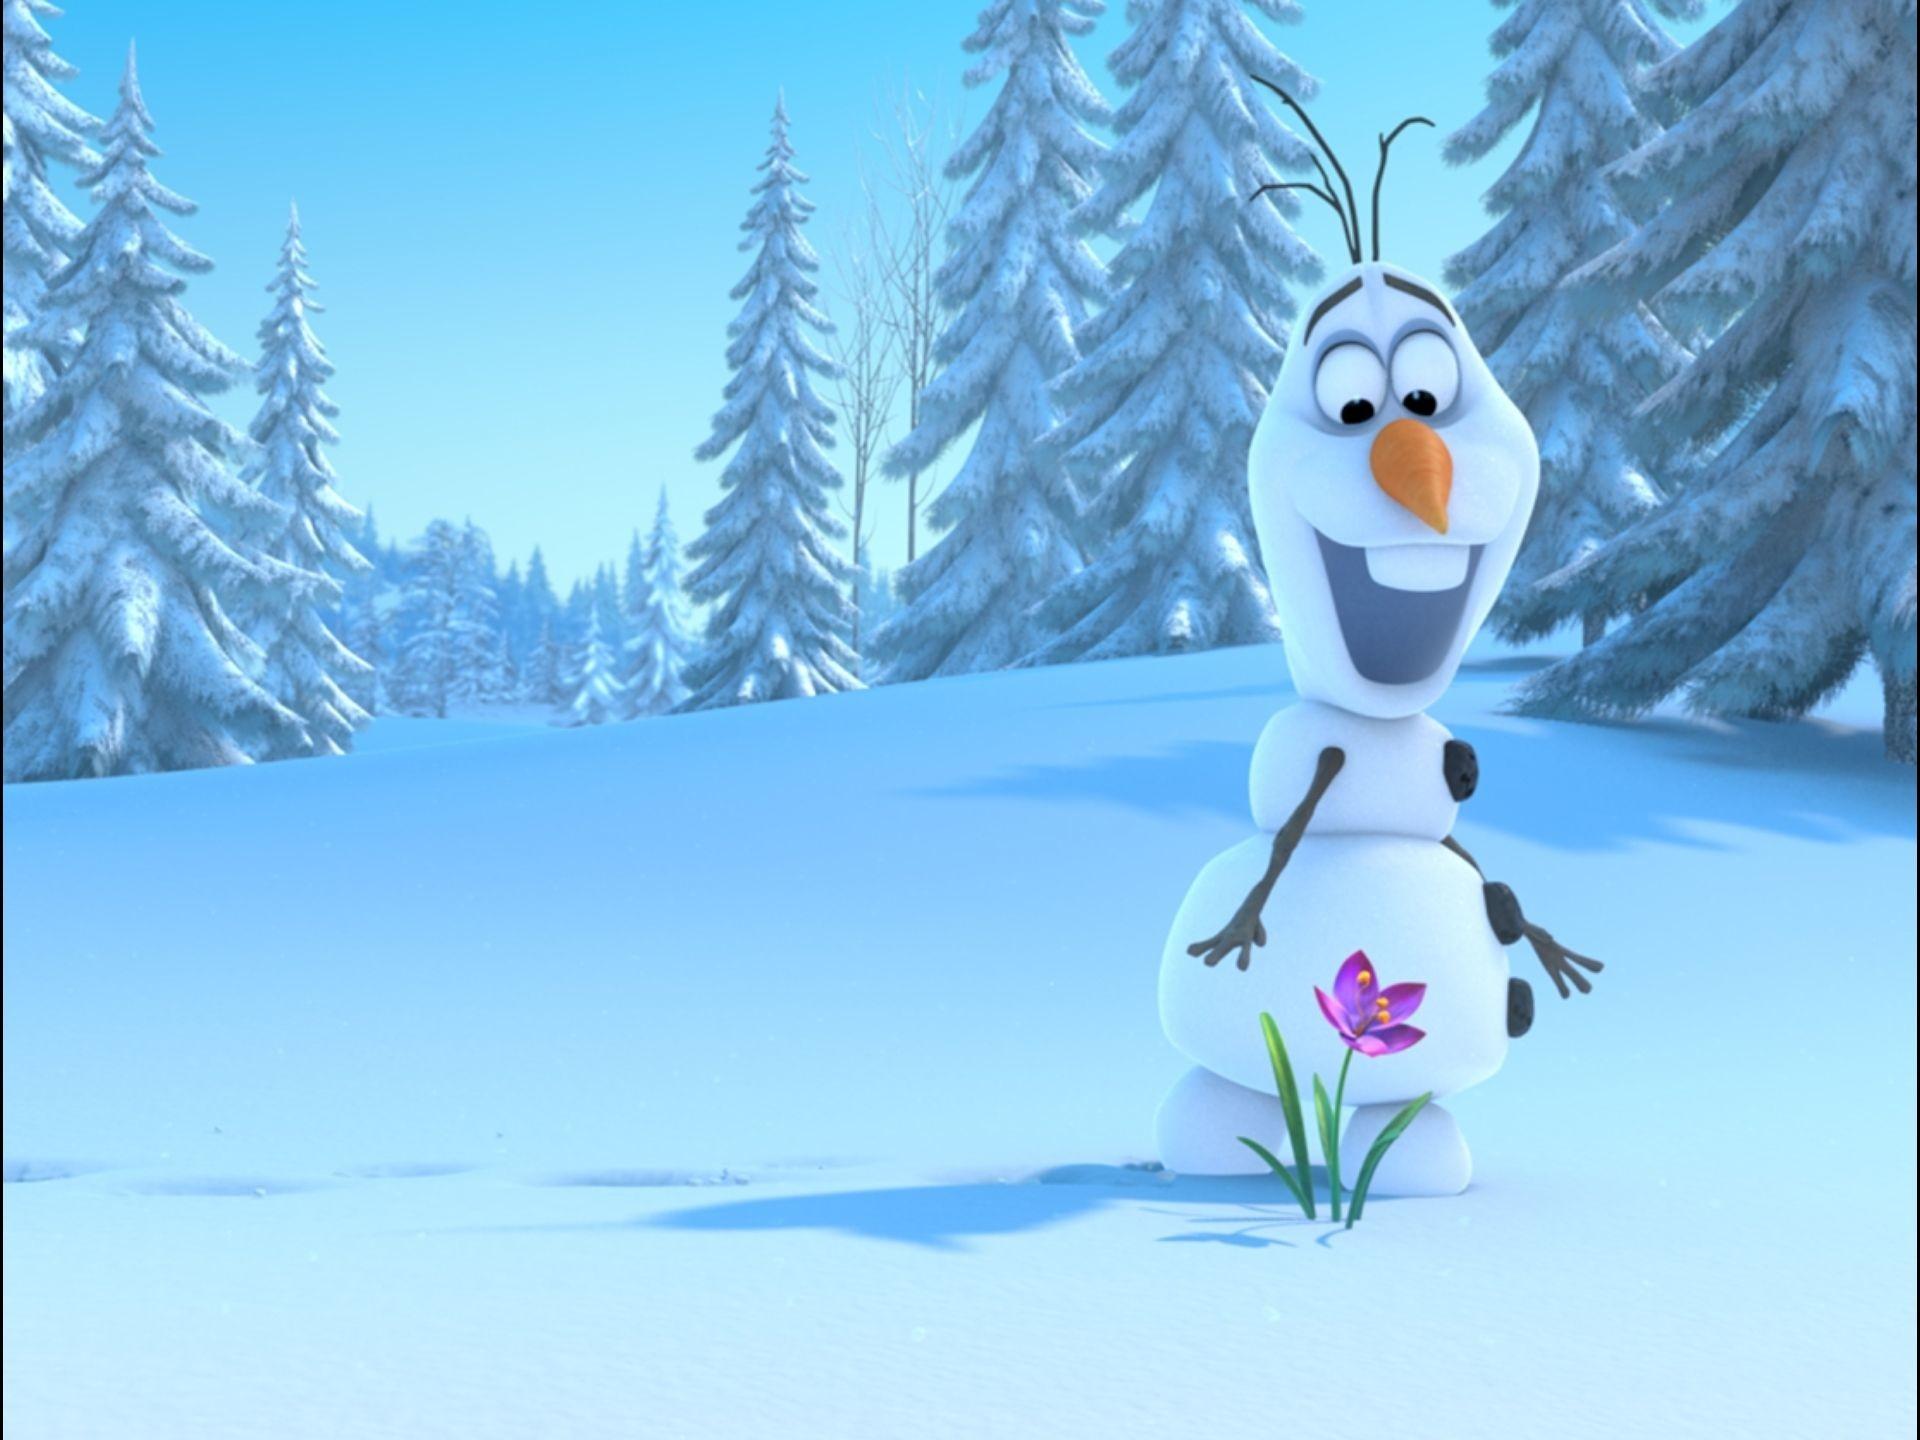 Disney Frozen Olaf HD Wallpaper Image for Tablet